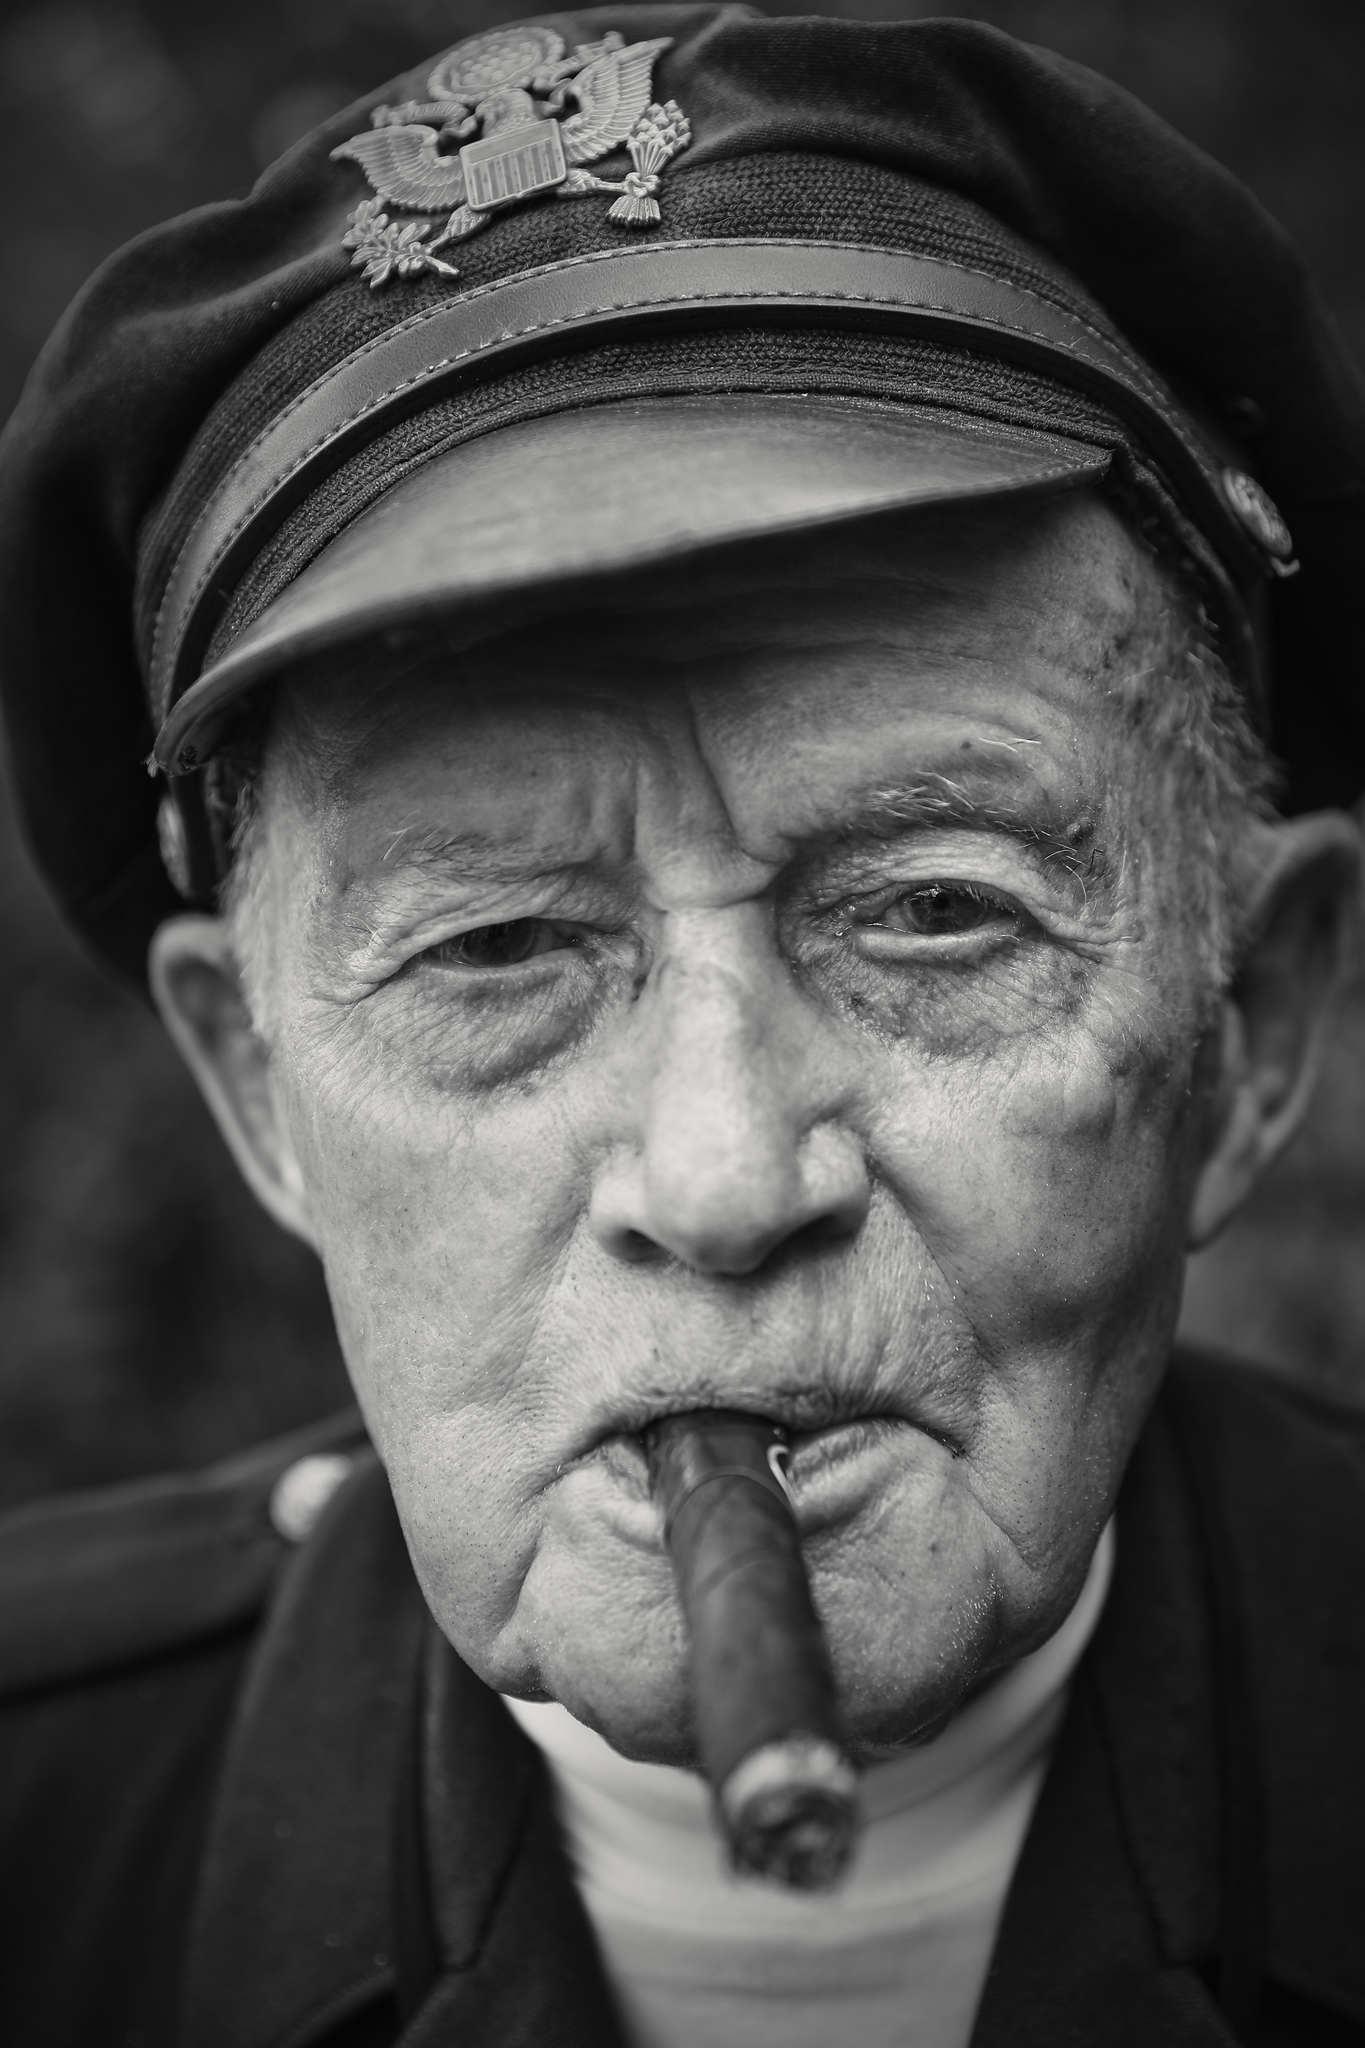 D-DAY VETERANS, FRANCE - JUNE 5: Dennis Thompson (96 yrs old), a former B-24 and B-17 bomber pilot,